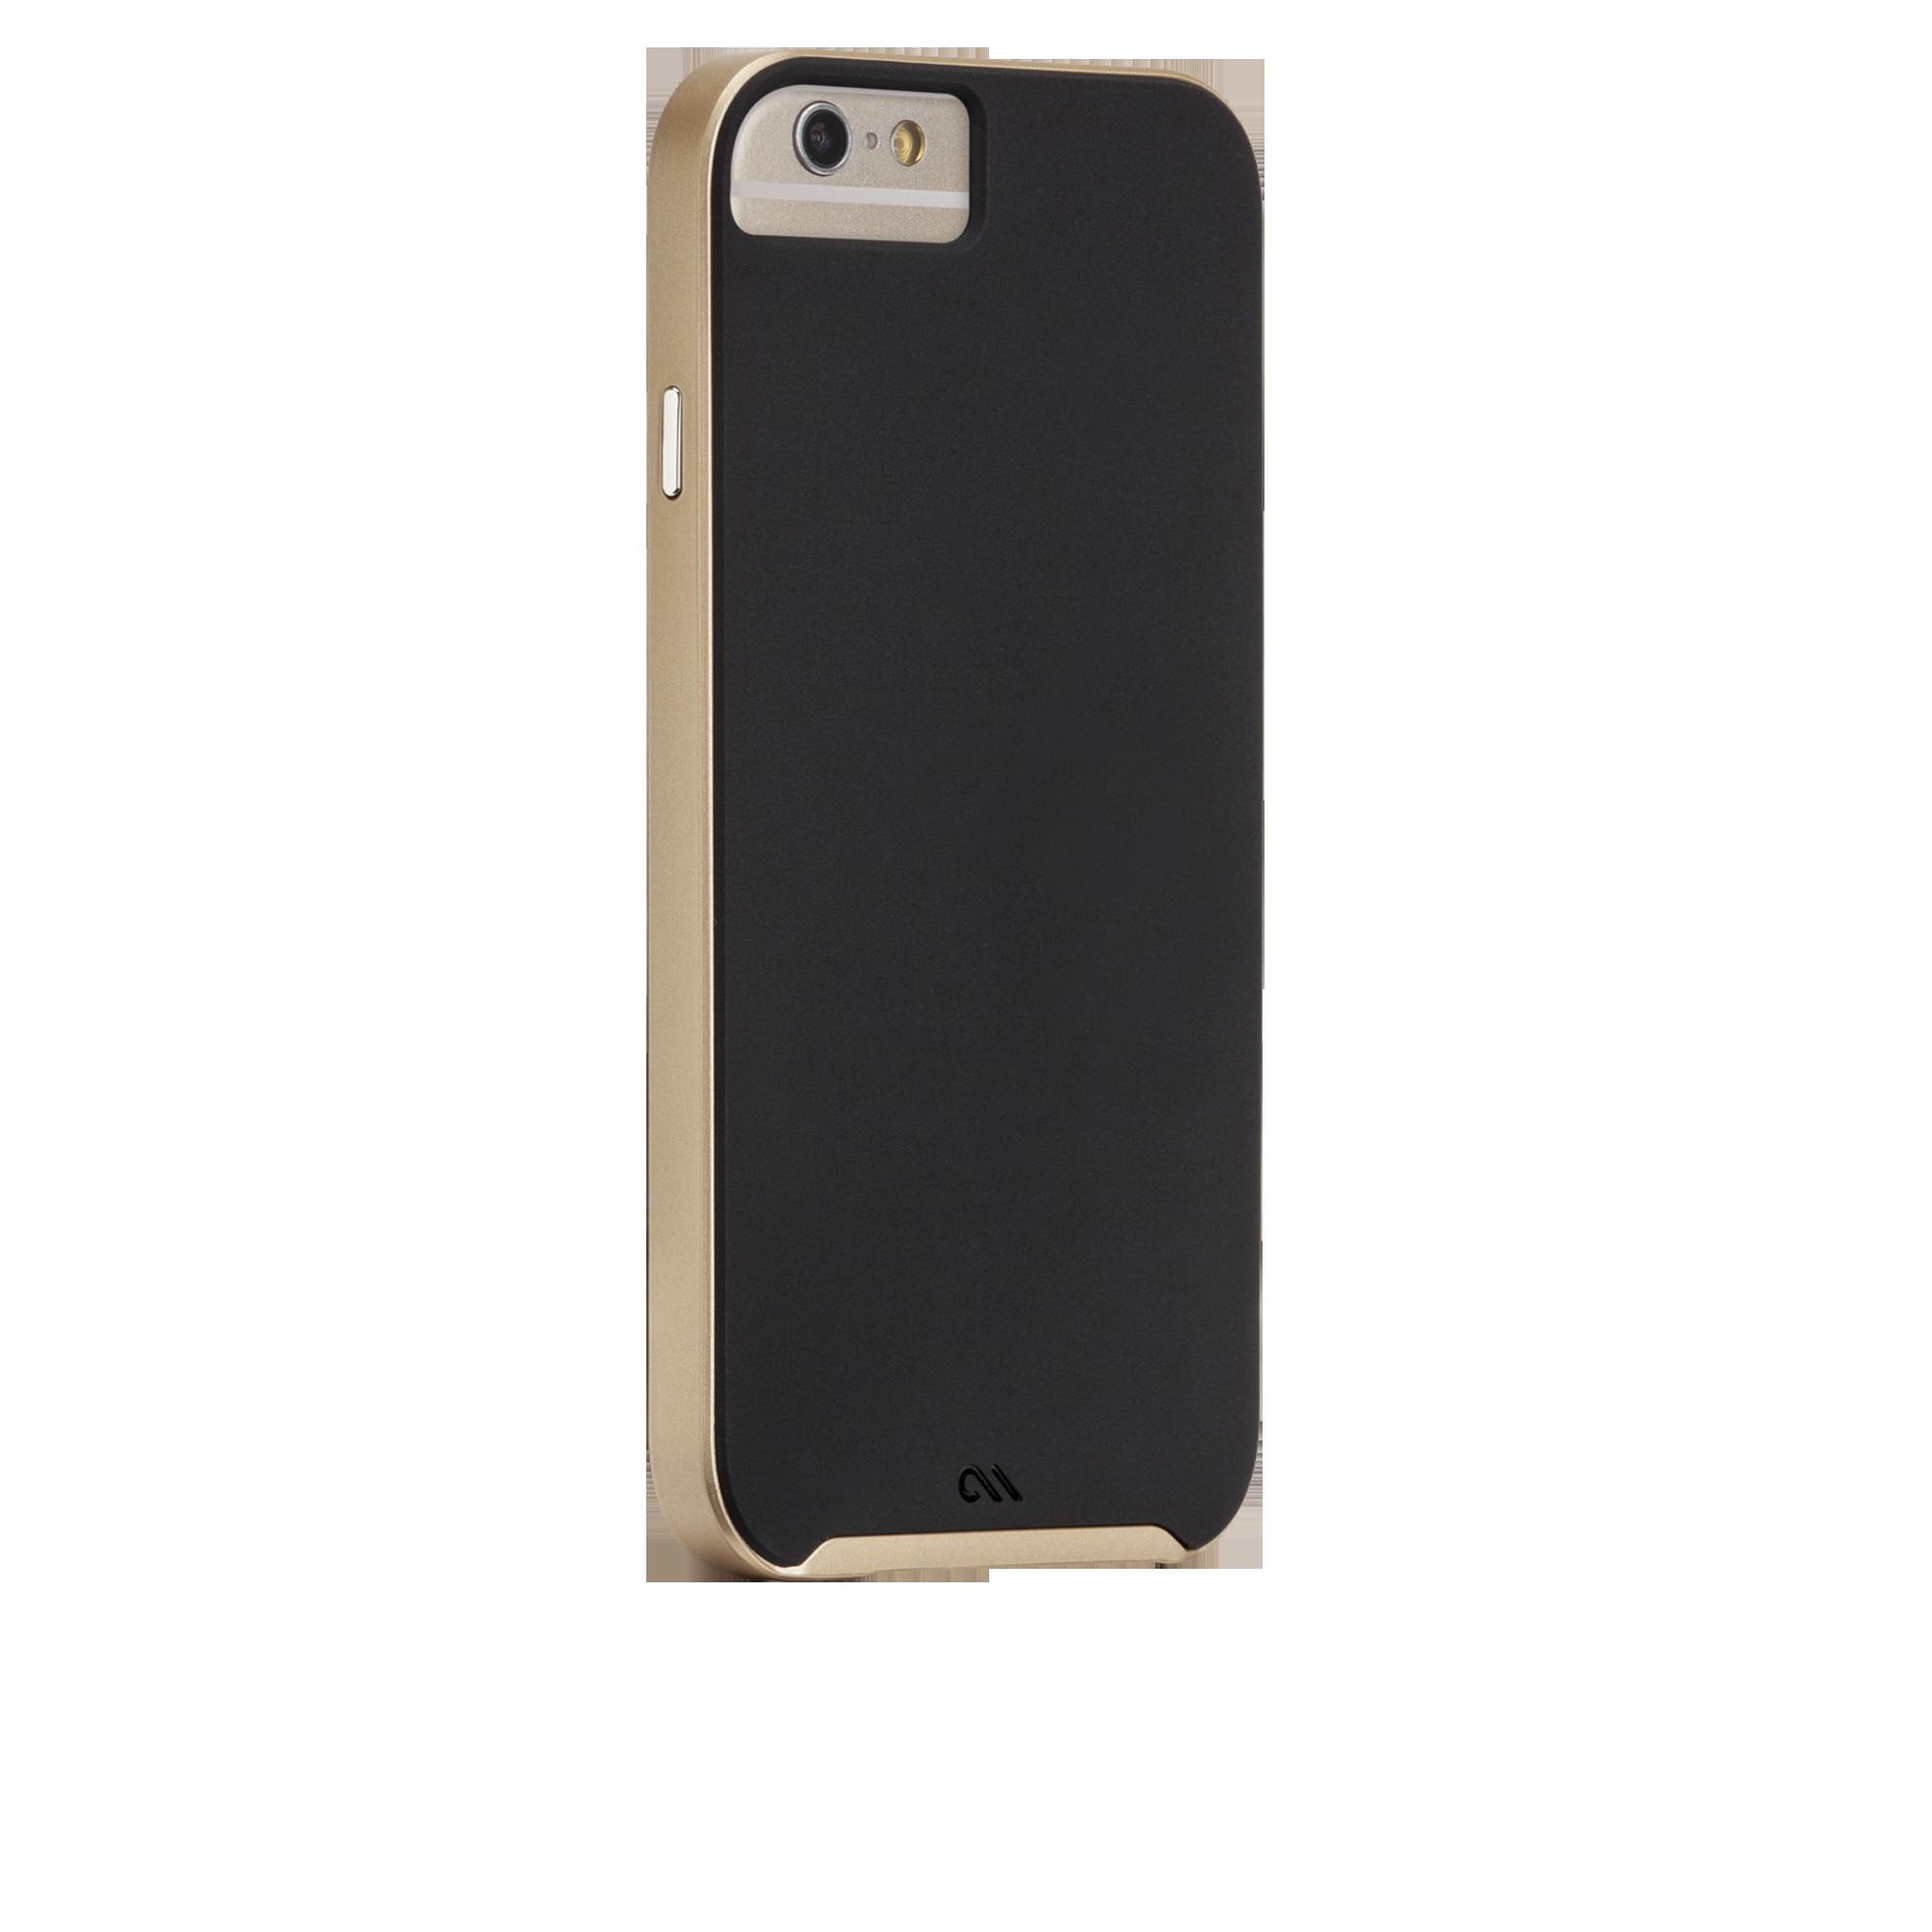 Slim Tough Case - Black & Gold